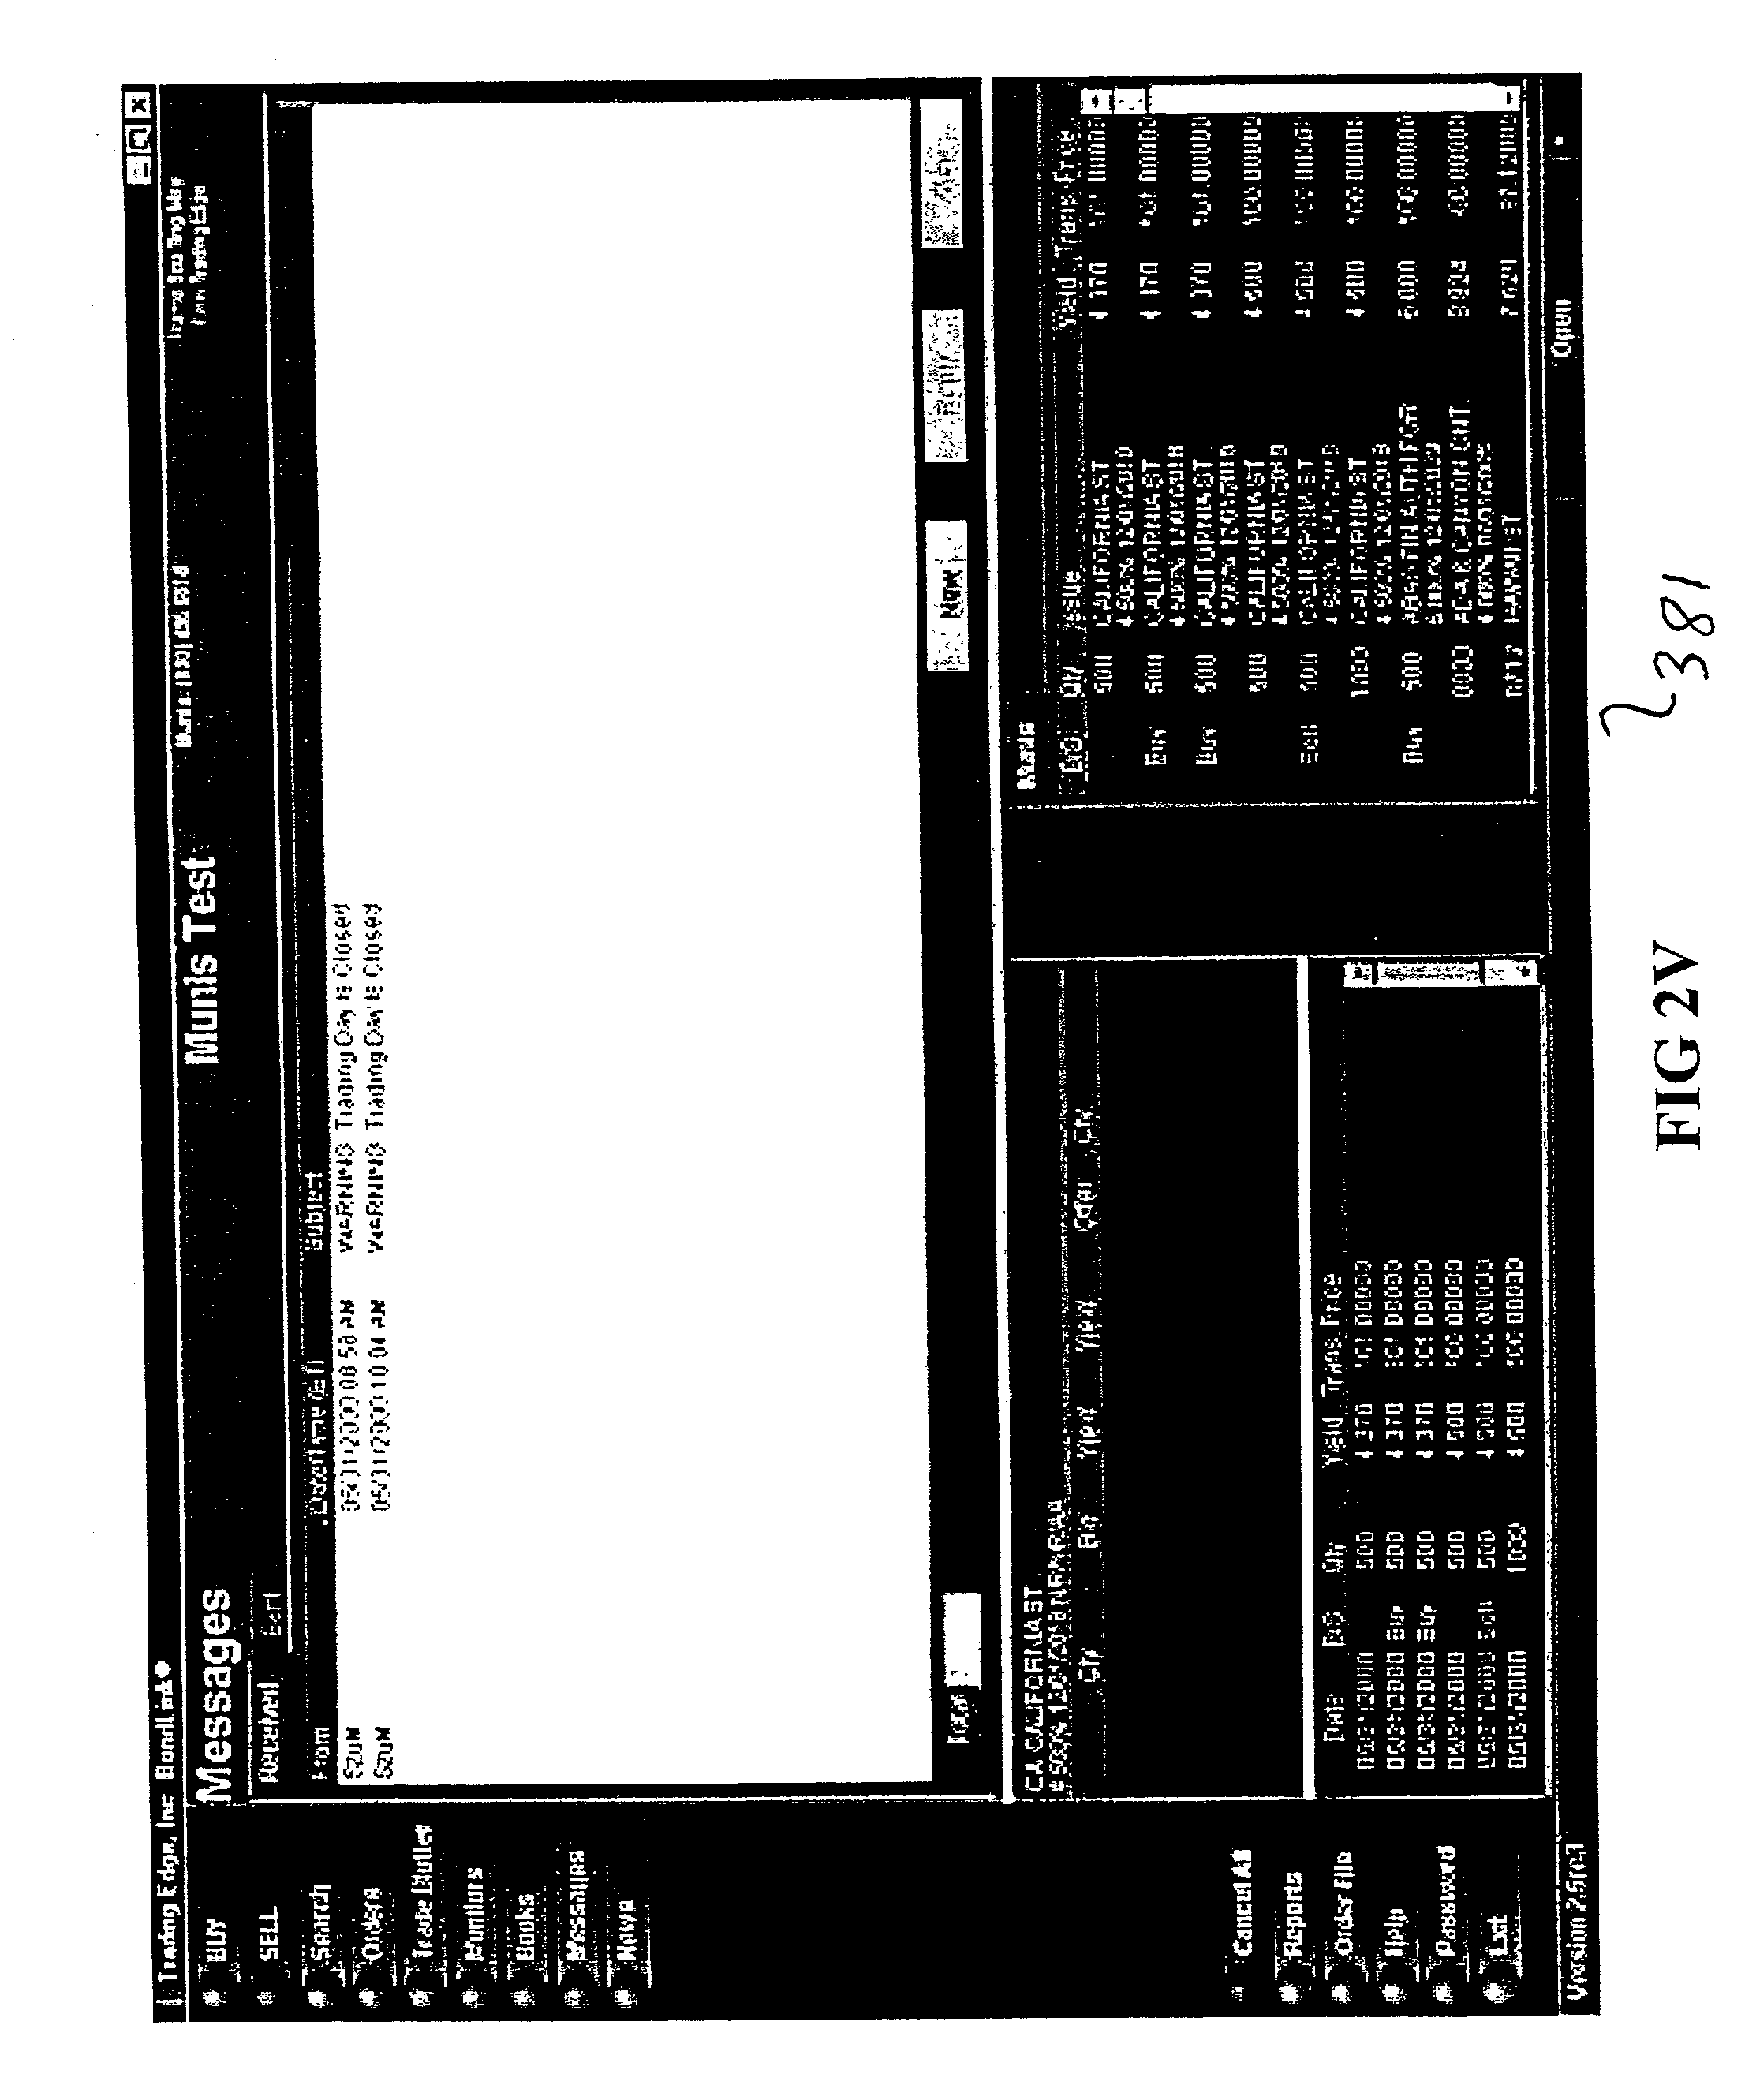 Convertible bond trading system